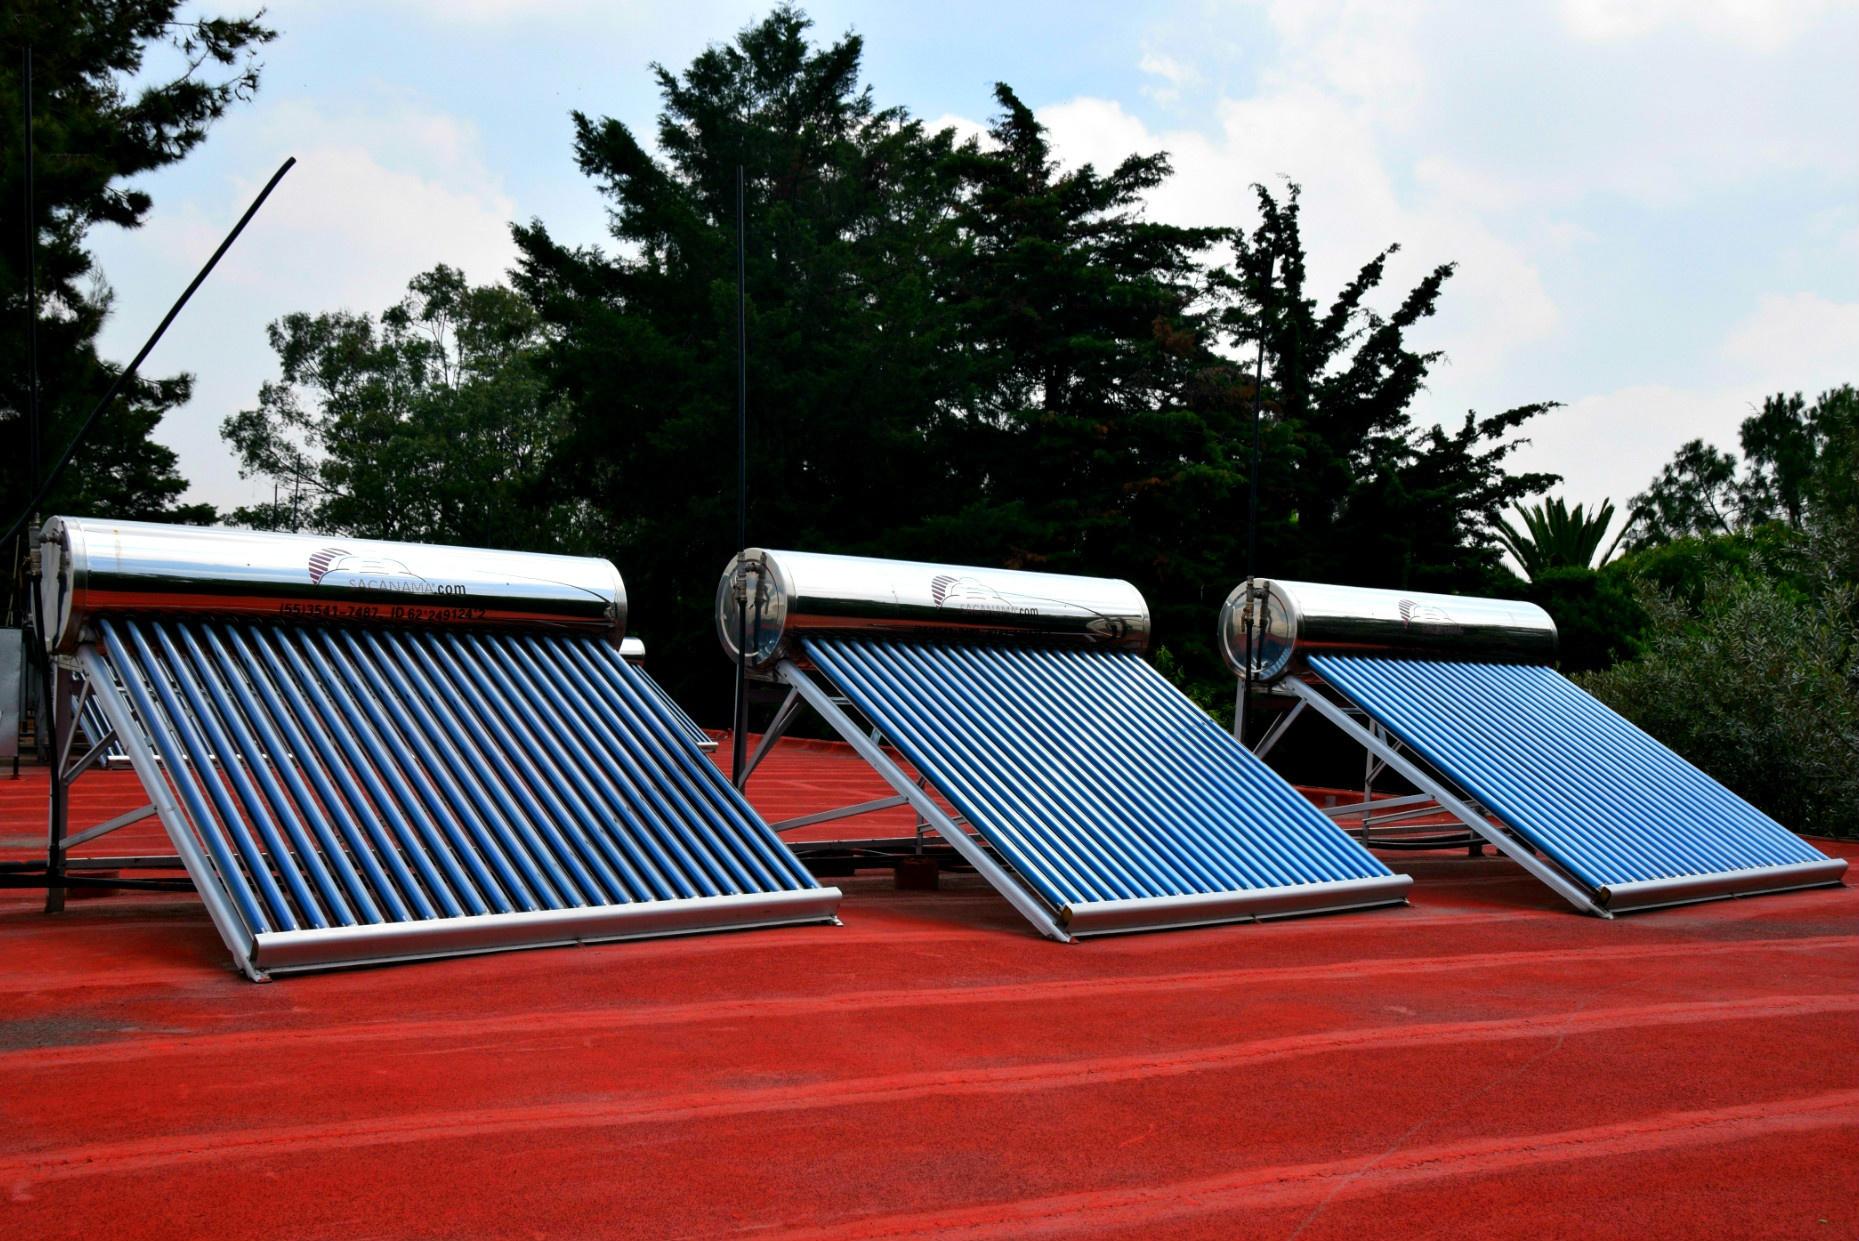 https://0201.nccdn.net/1_2/000/000/118/5d8/calentadores-solares-1859x1241.jpg